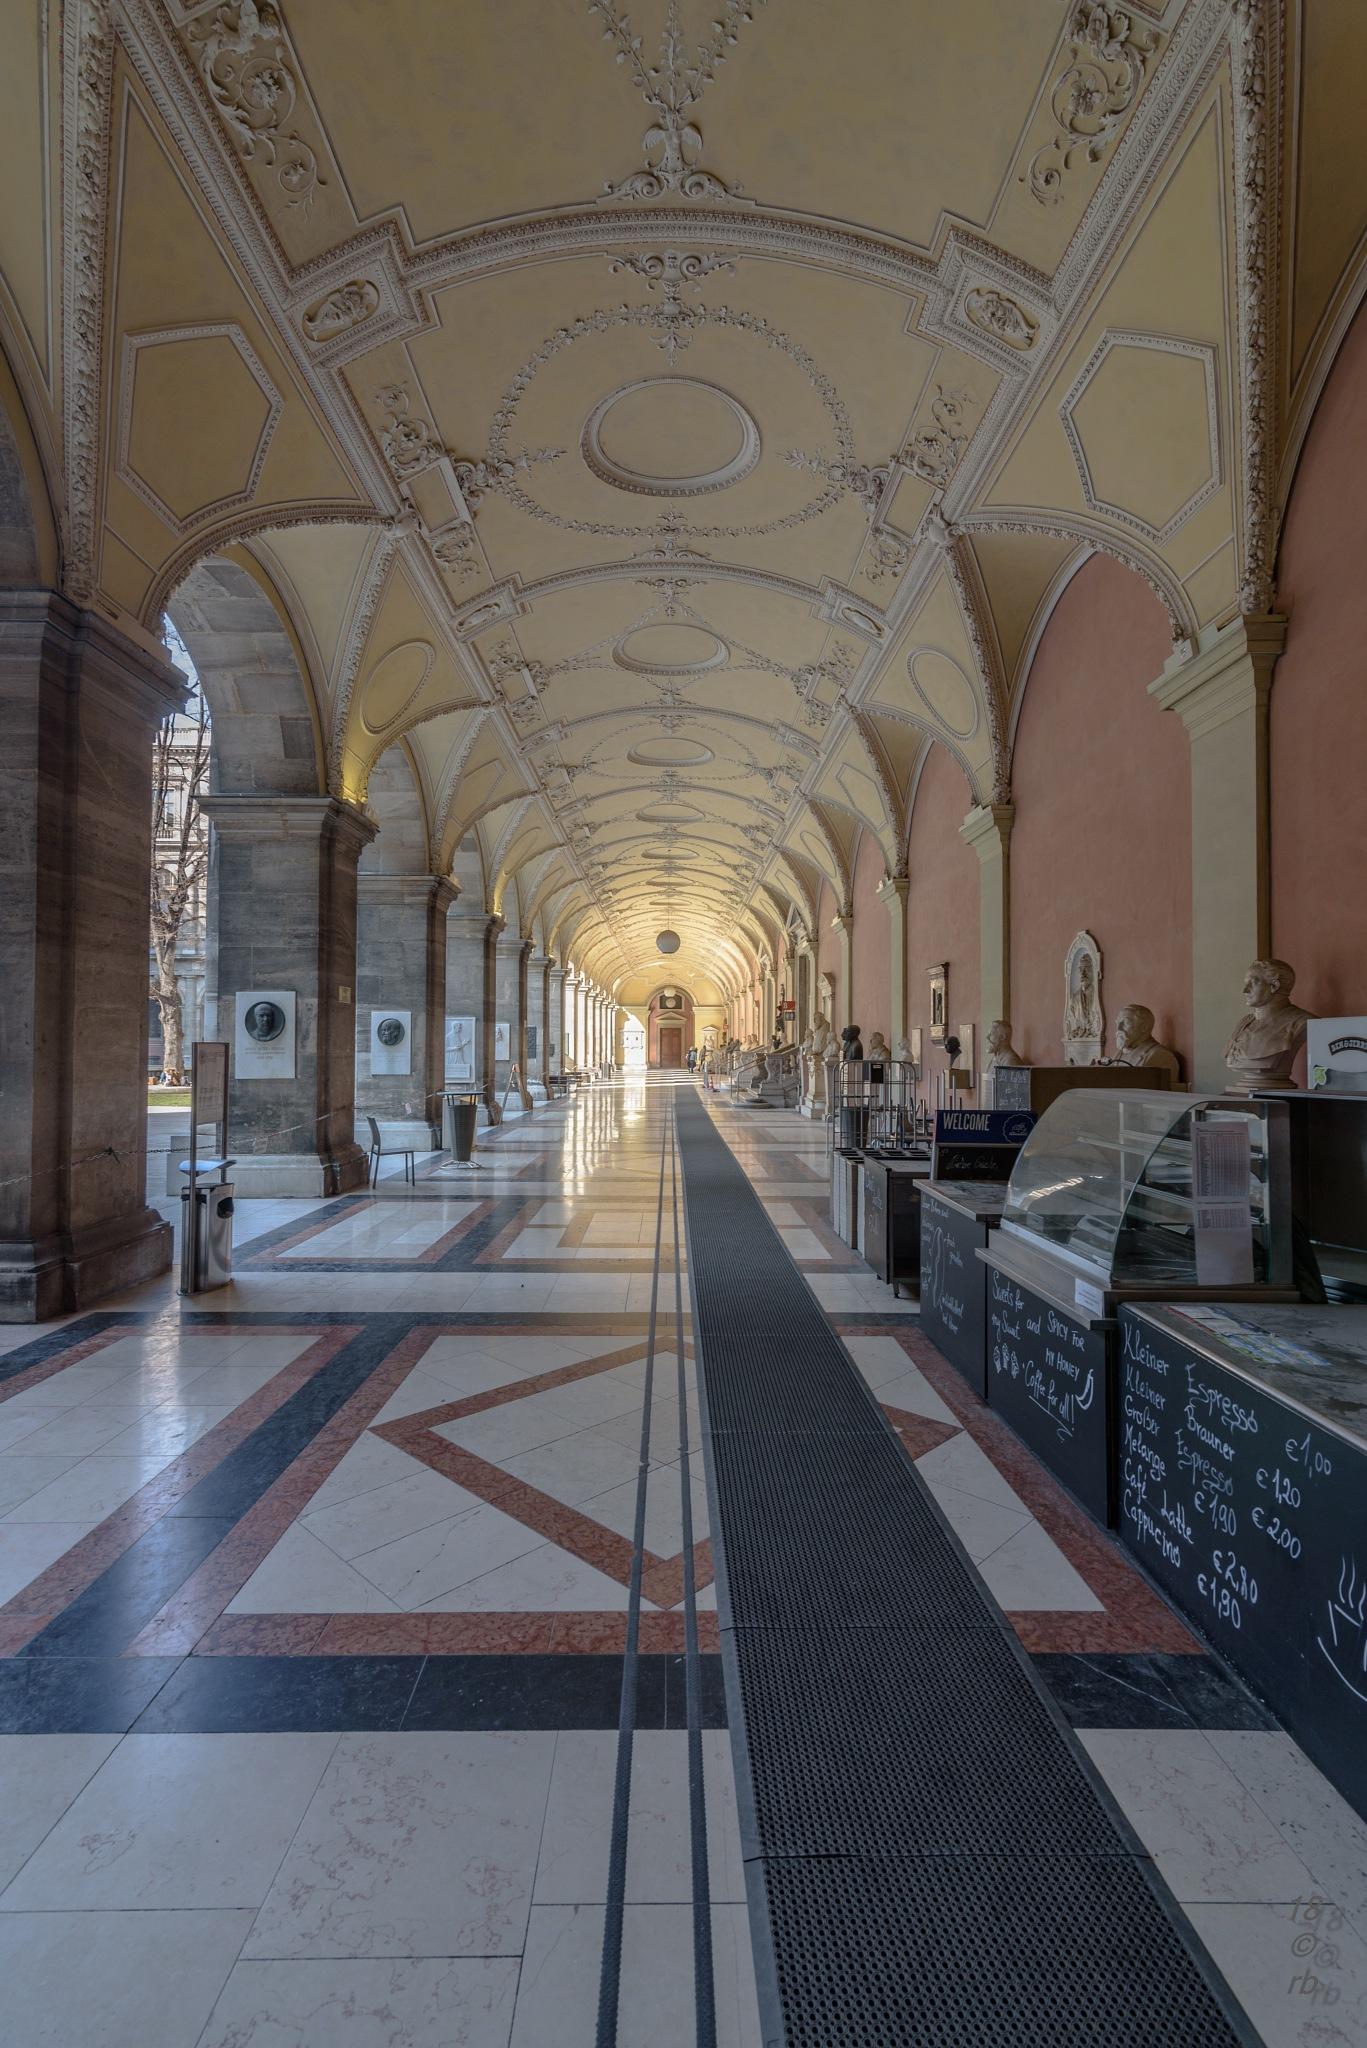 Uni Wien by > Robert Braun <